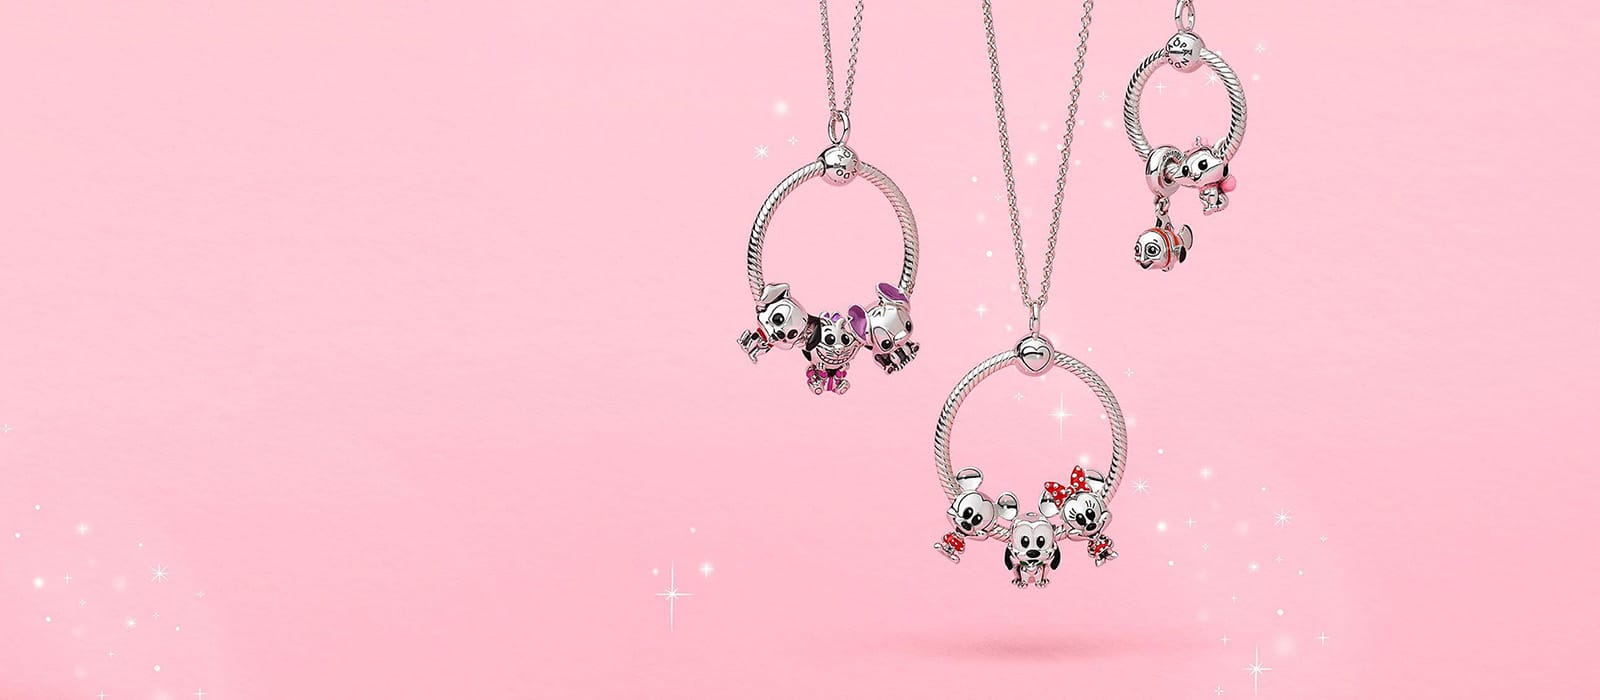 Nieuwe Disney sieraden <br> Pandora Jewelry